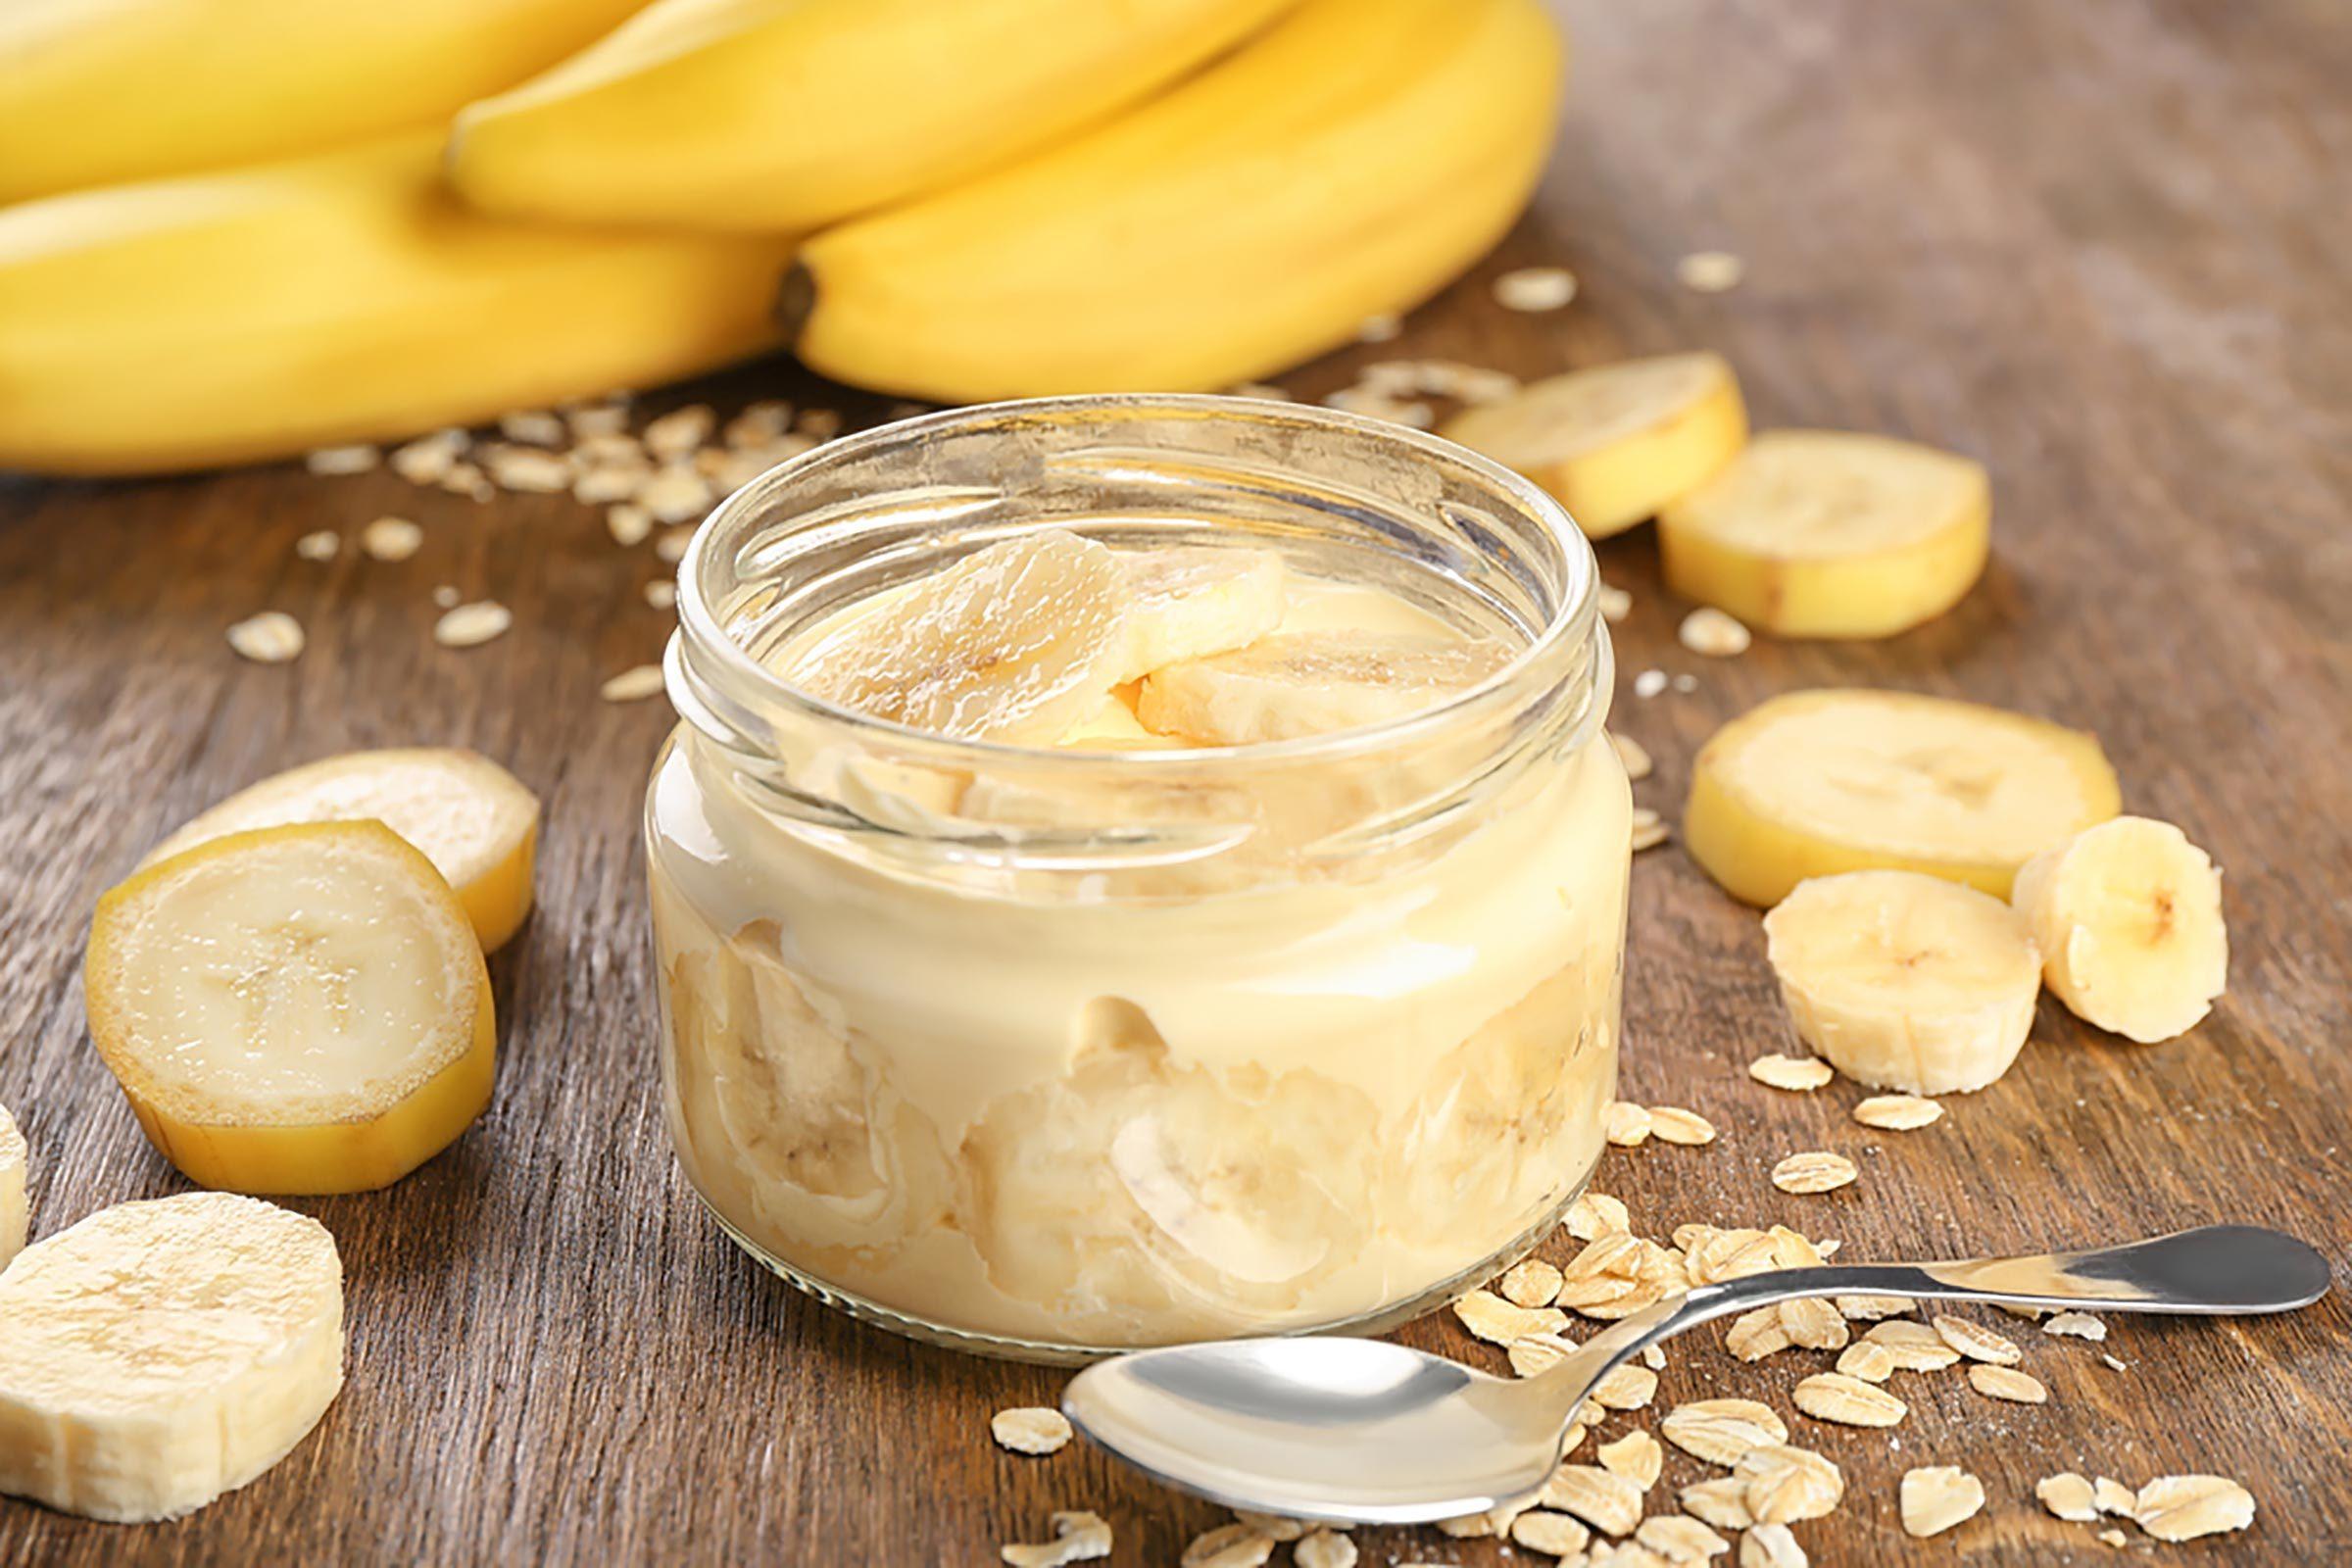 Overripe Bananas 8 Healthy Recipes Reader S Digest